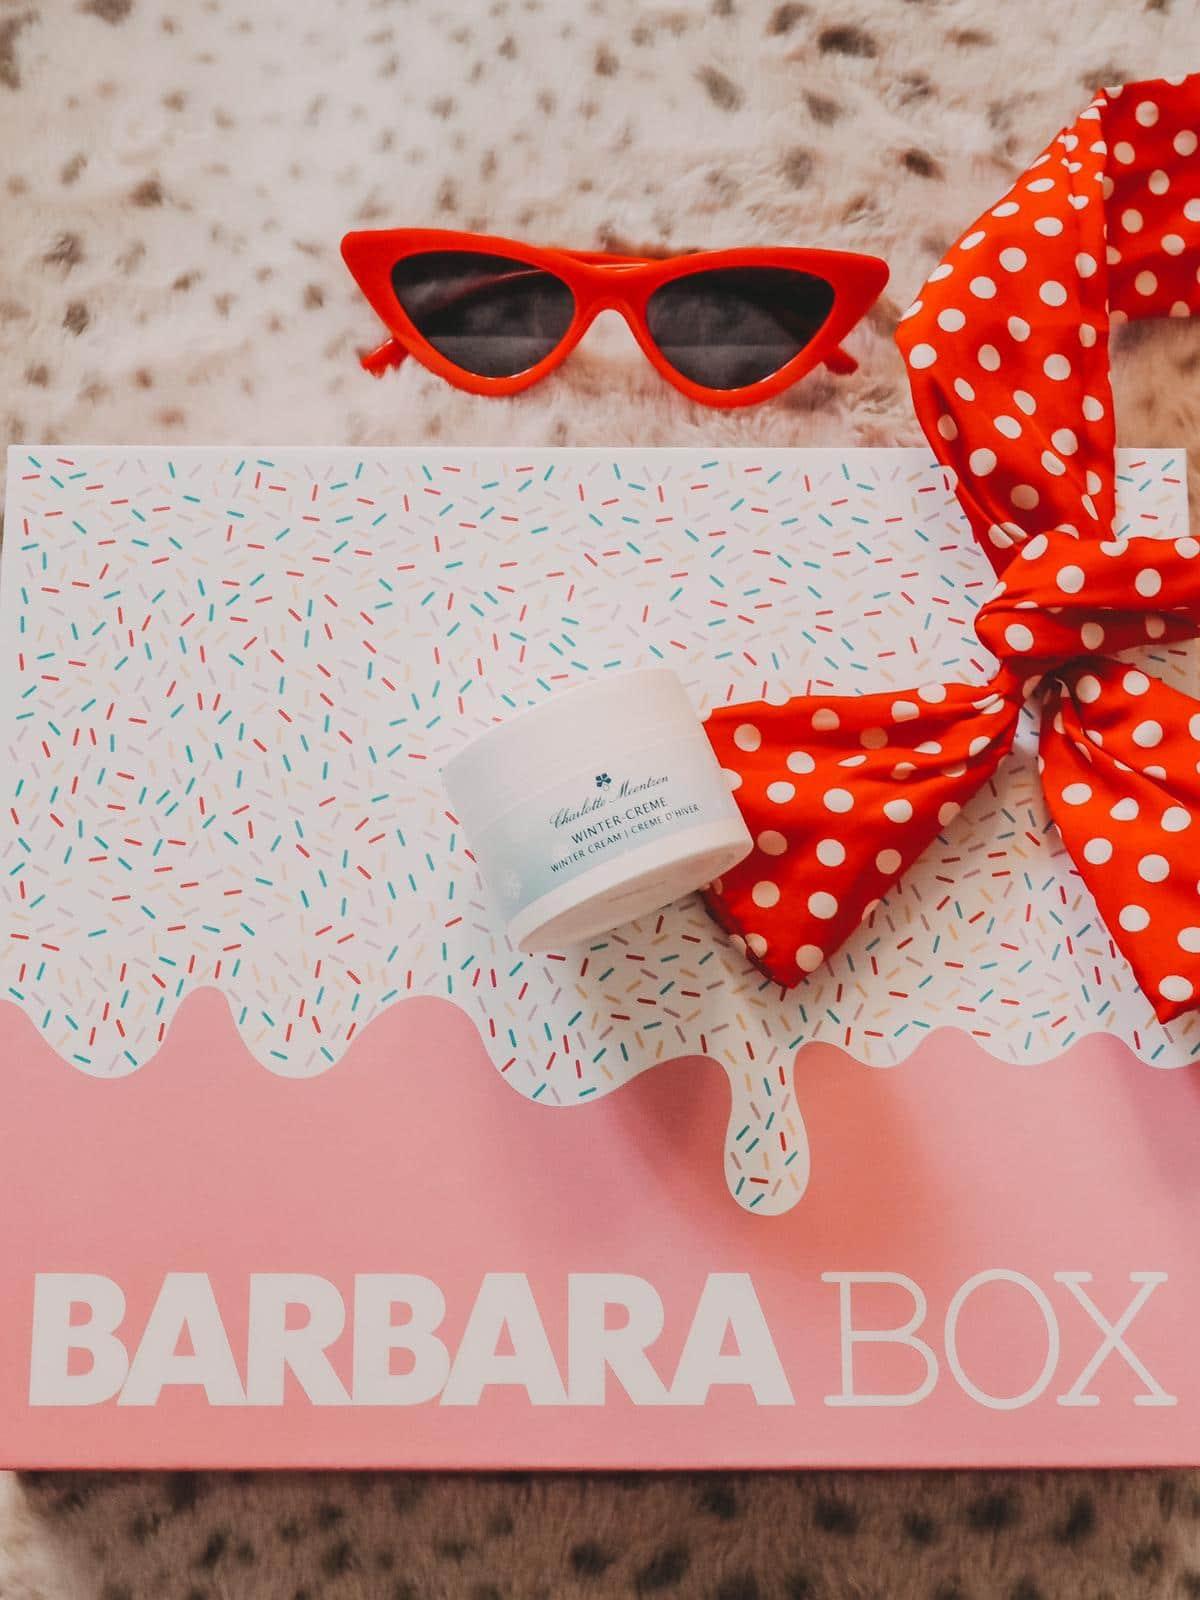 Barbara Box Sahneschnitte mit Wintercreme